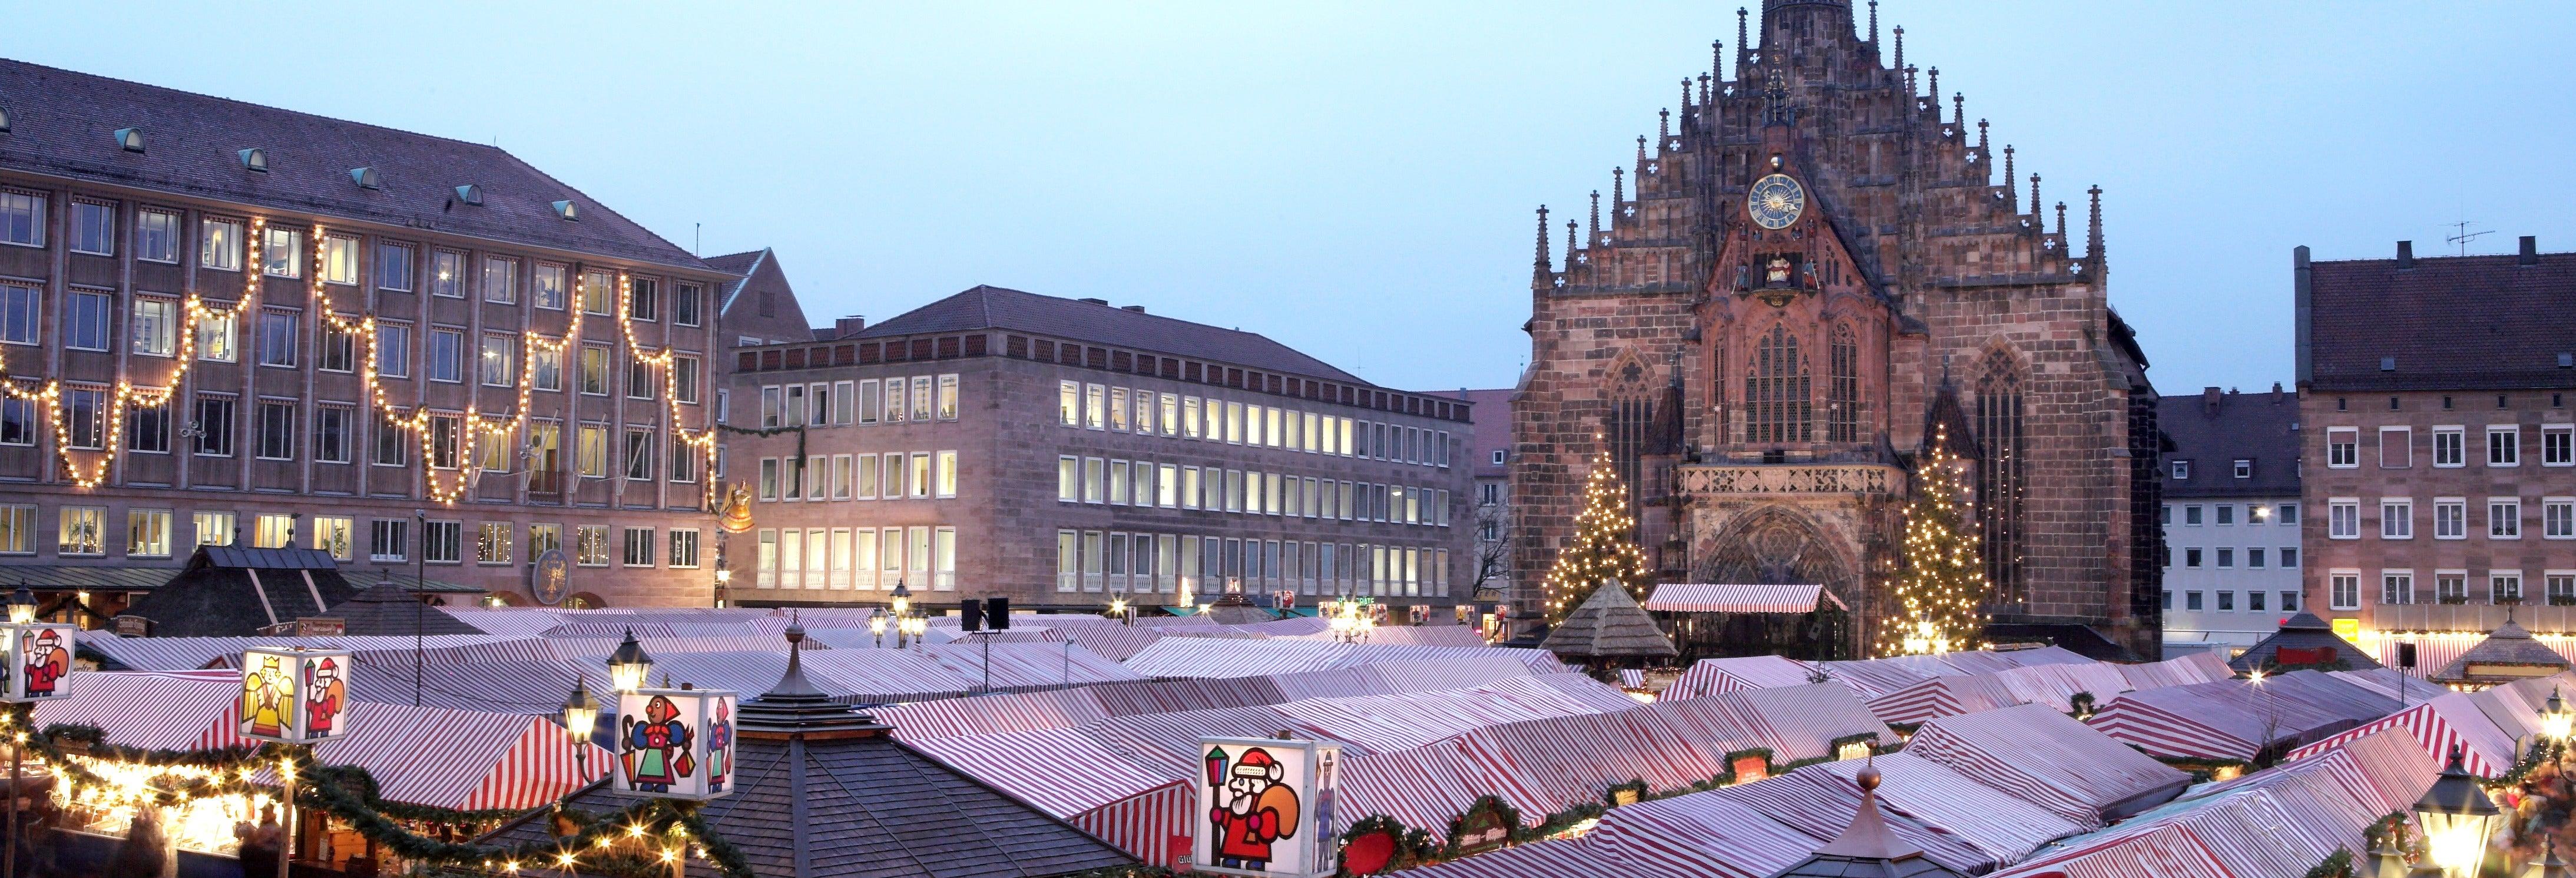 Tour dei mercatini di Natale di Norimberga